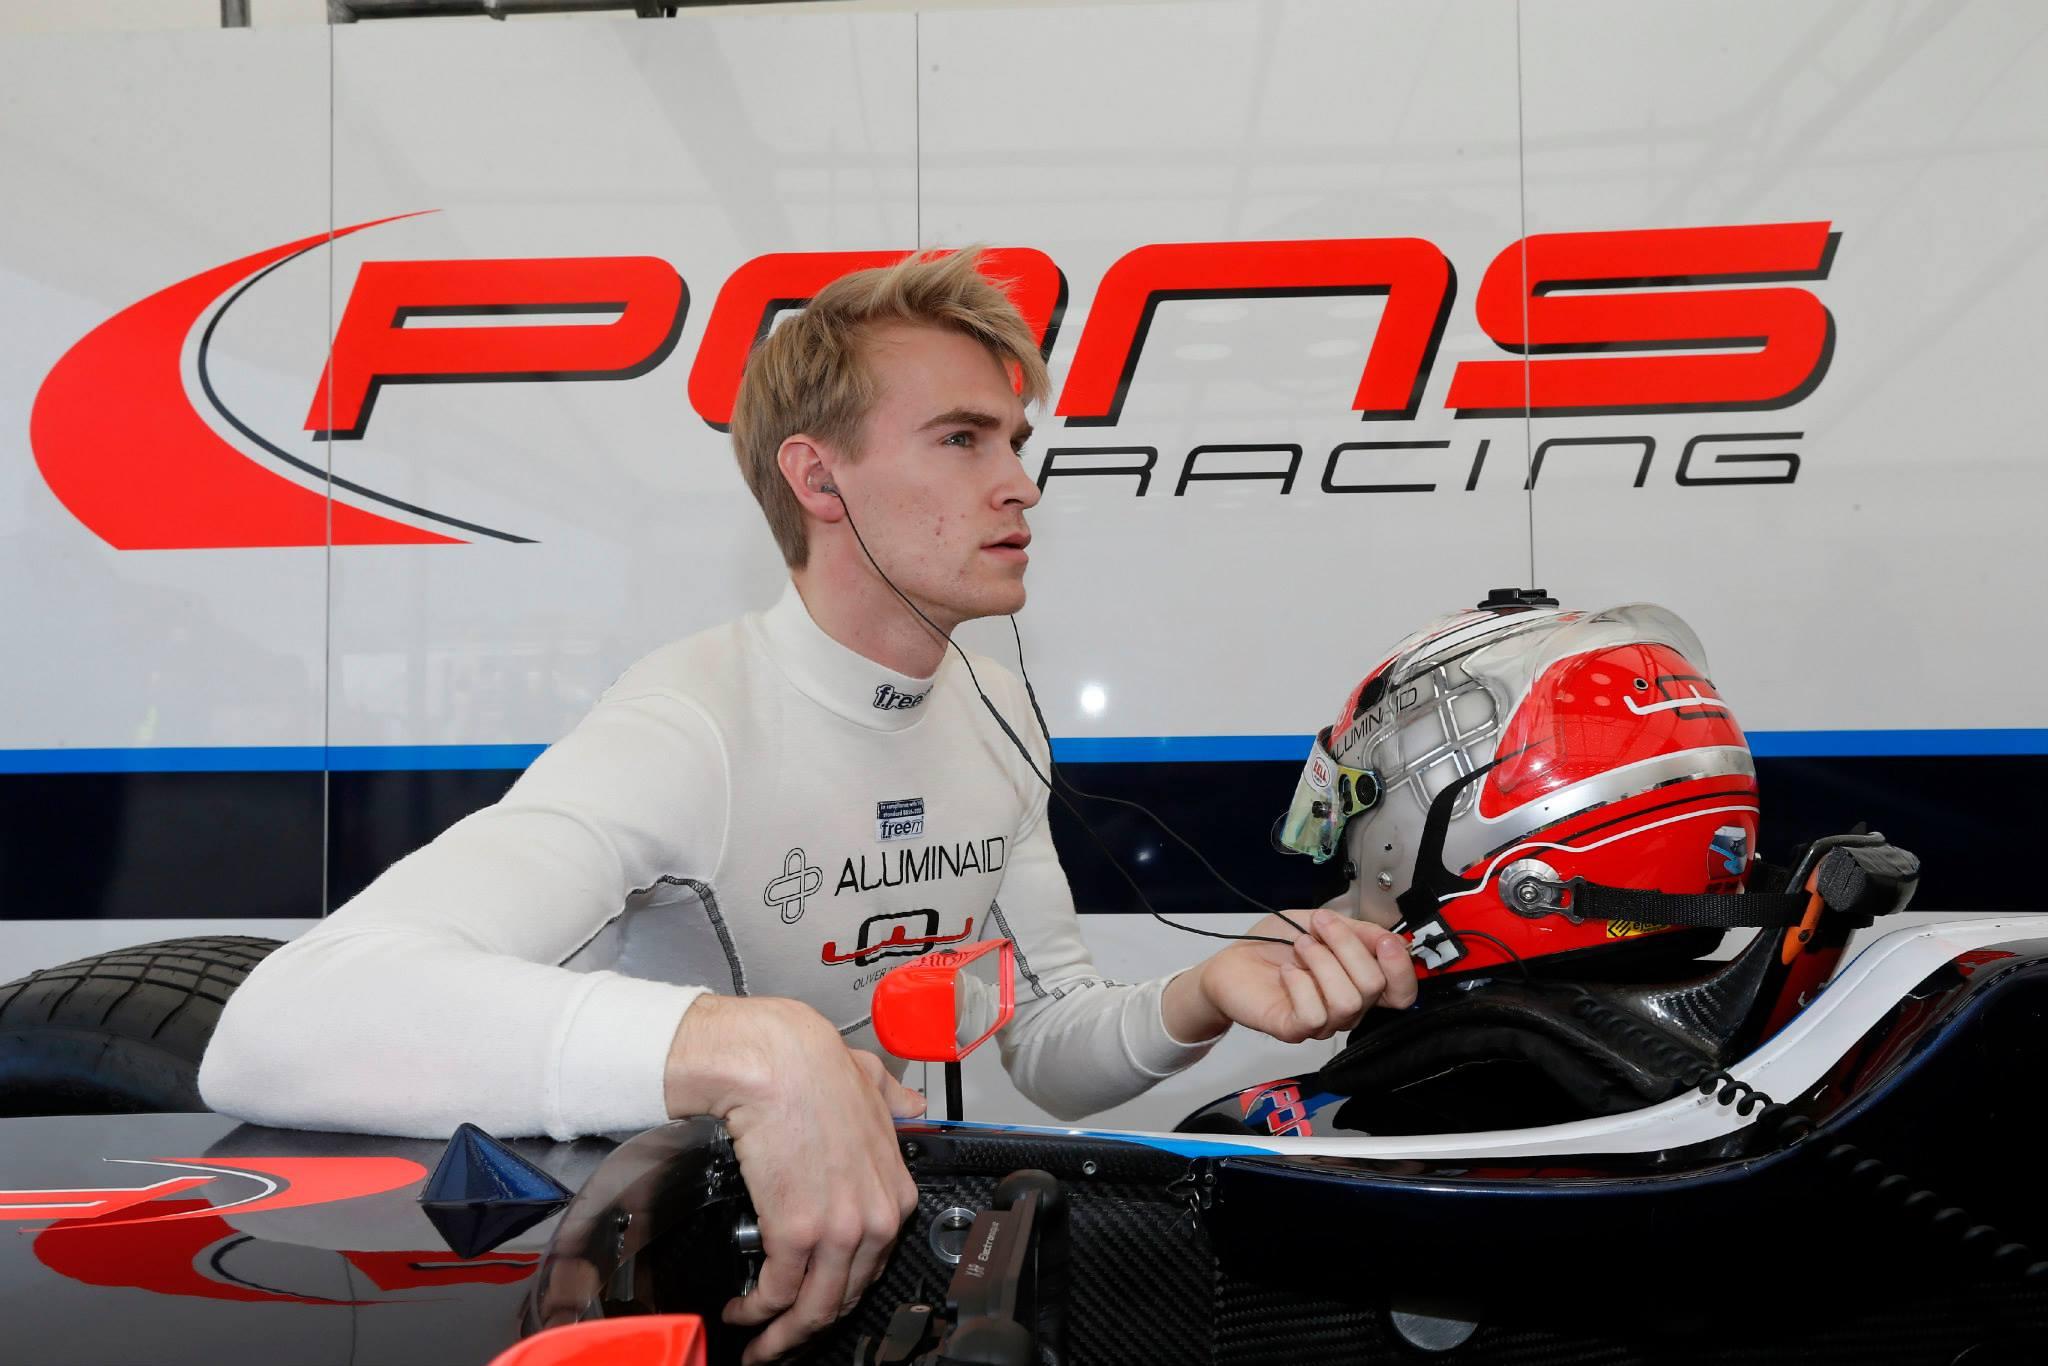 2014 Formula Renault 3.5 Series - Monza - Oliver Rowland